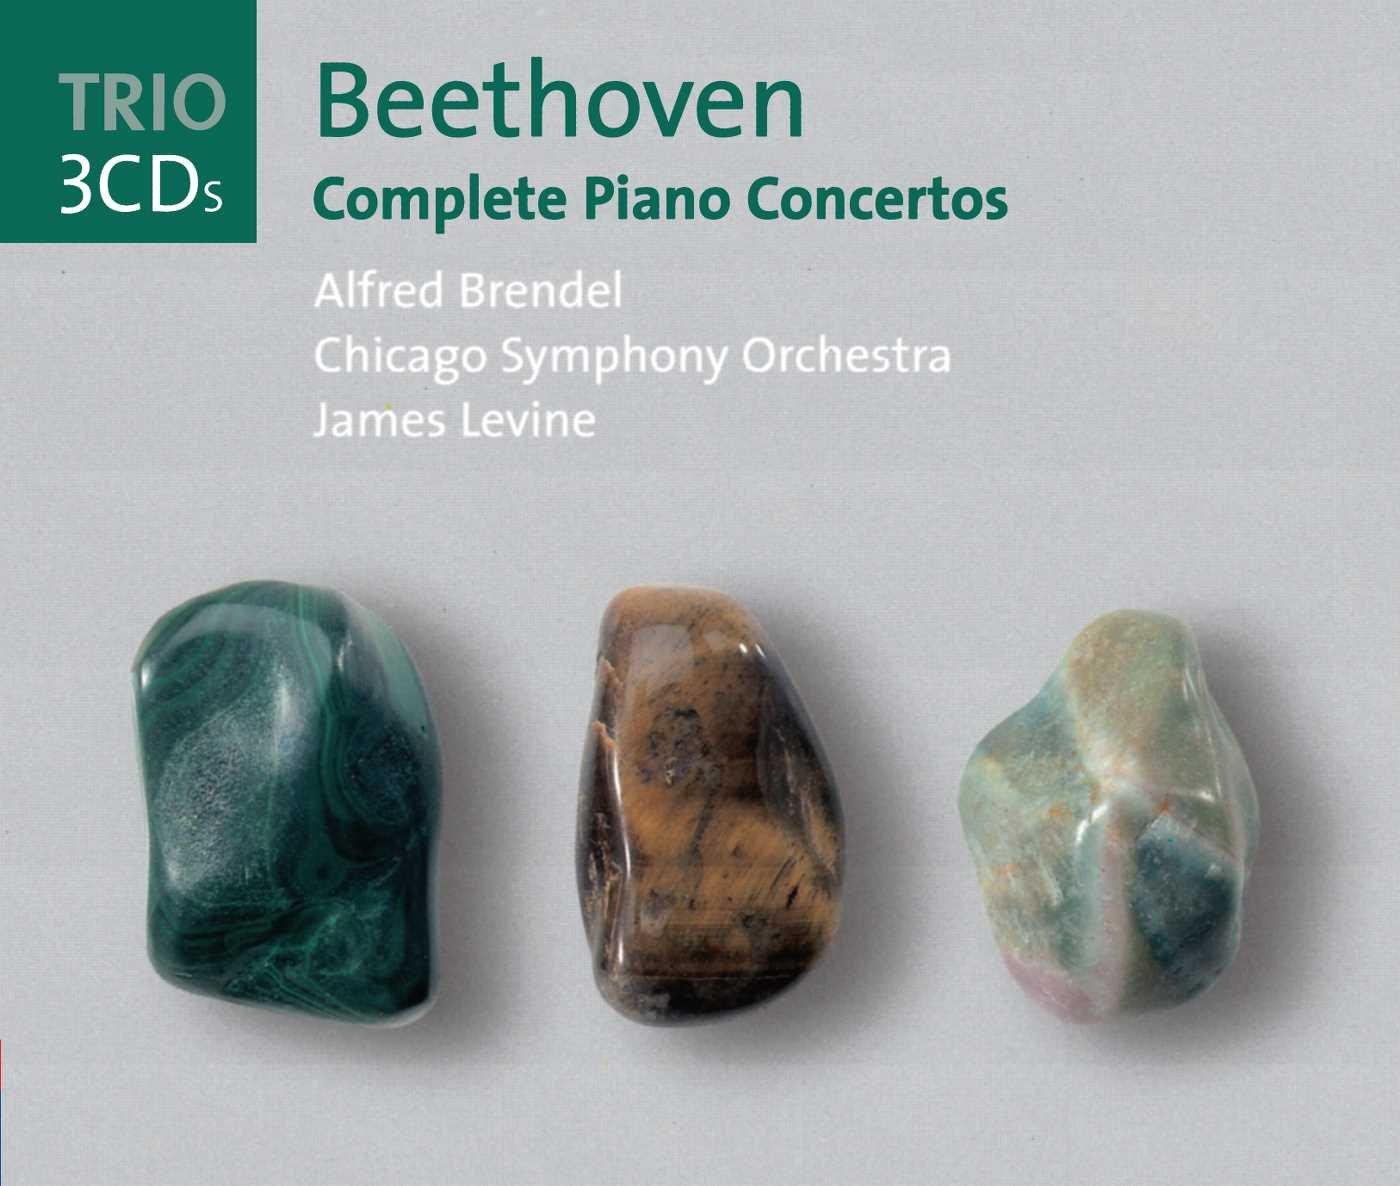 CD : Alfred Brendel - Complete Piano Concertos (CD)